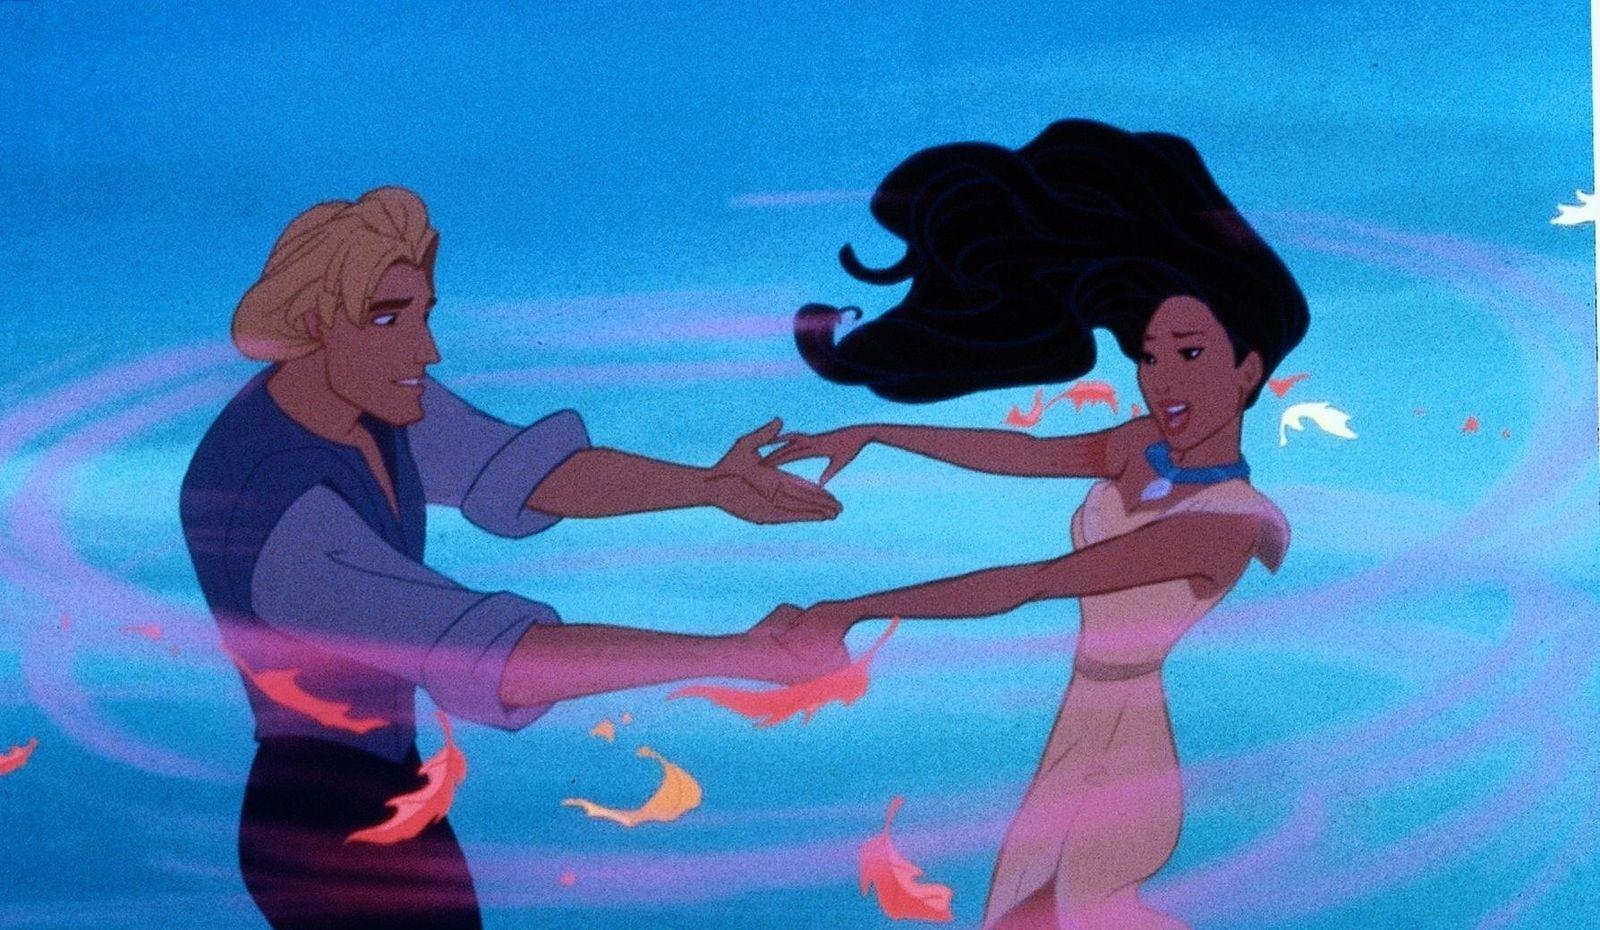 Fehler in Historienfilmen / Pocahontas